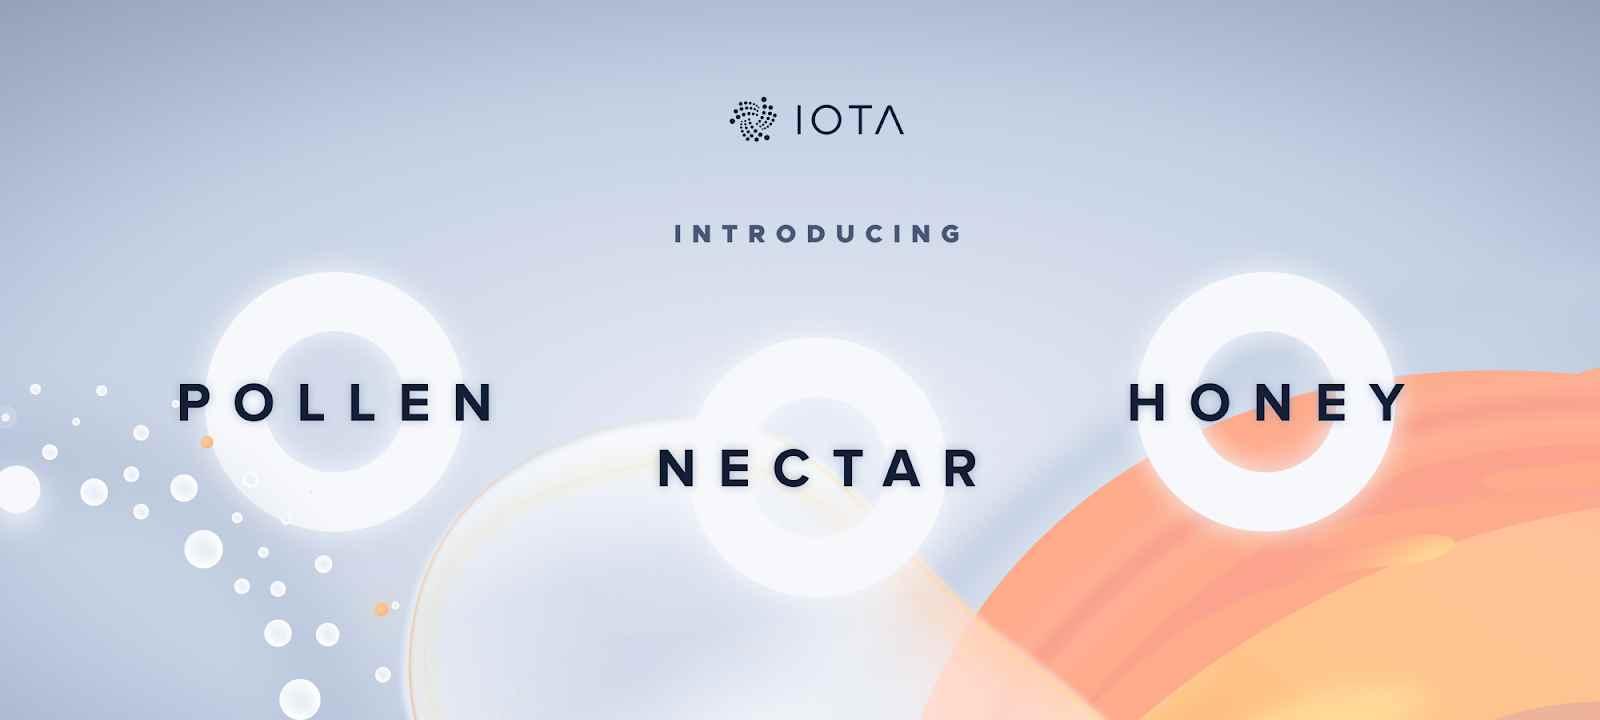 IOTA Nectar